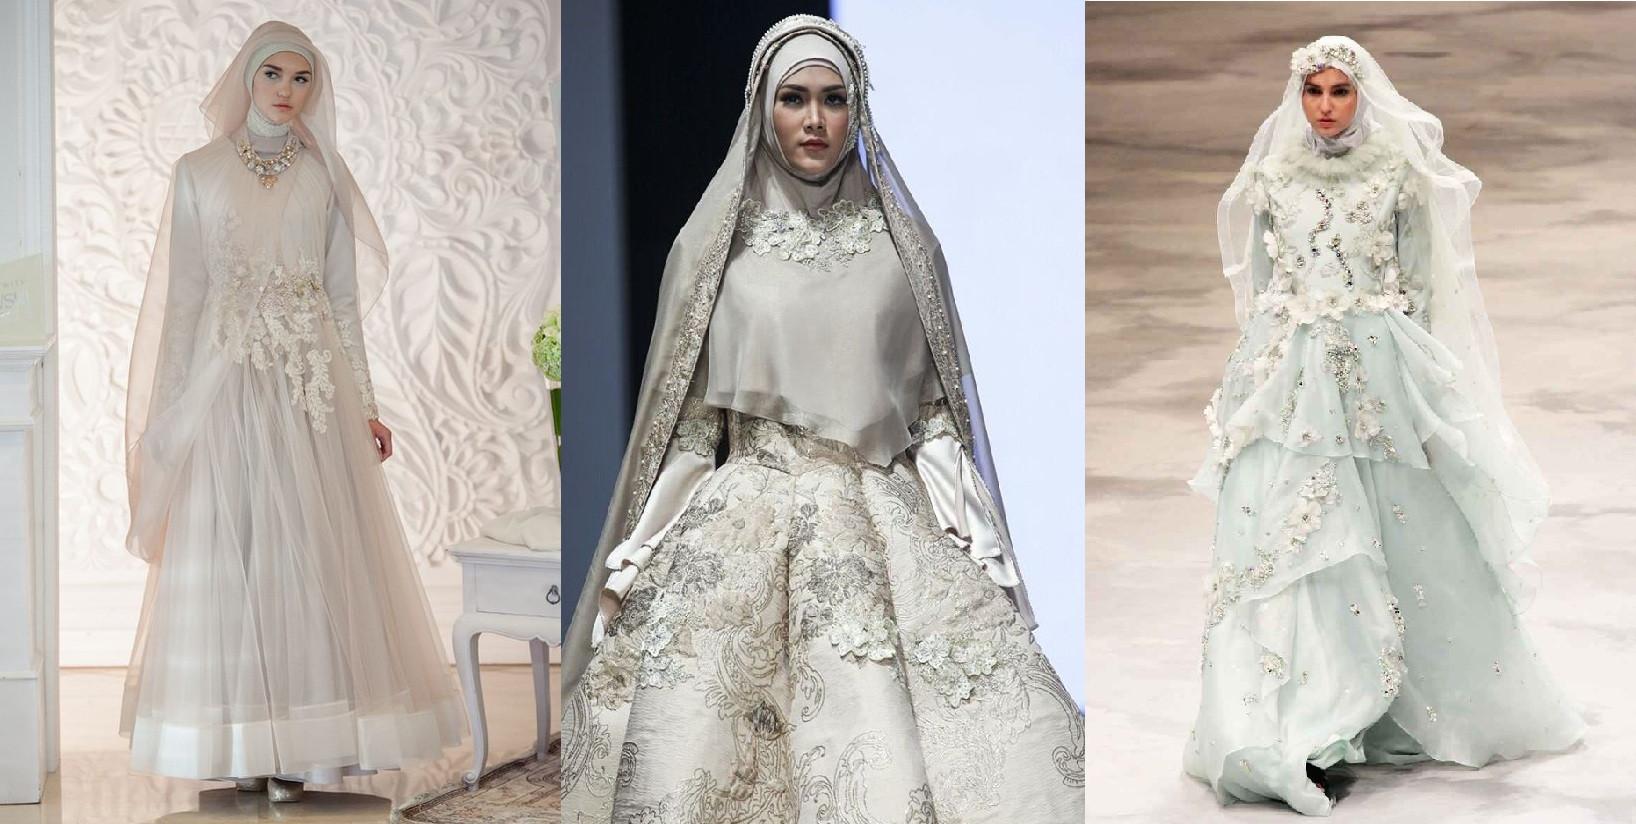 Gaun Pengantin Muslimah Bercadar Lovely Inspirasi Gaun Pengantin Untuk Muslimah Bercadar Prelo